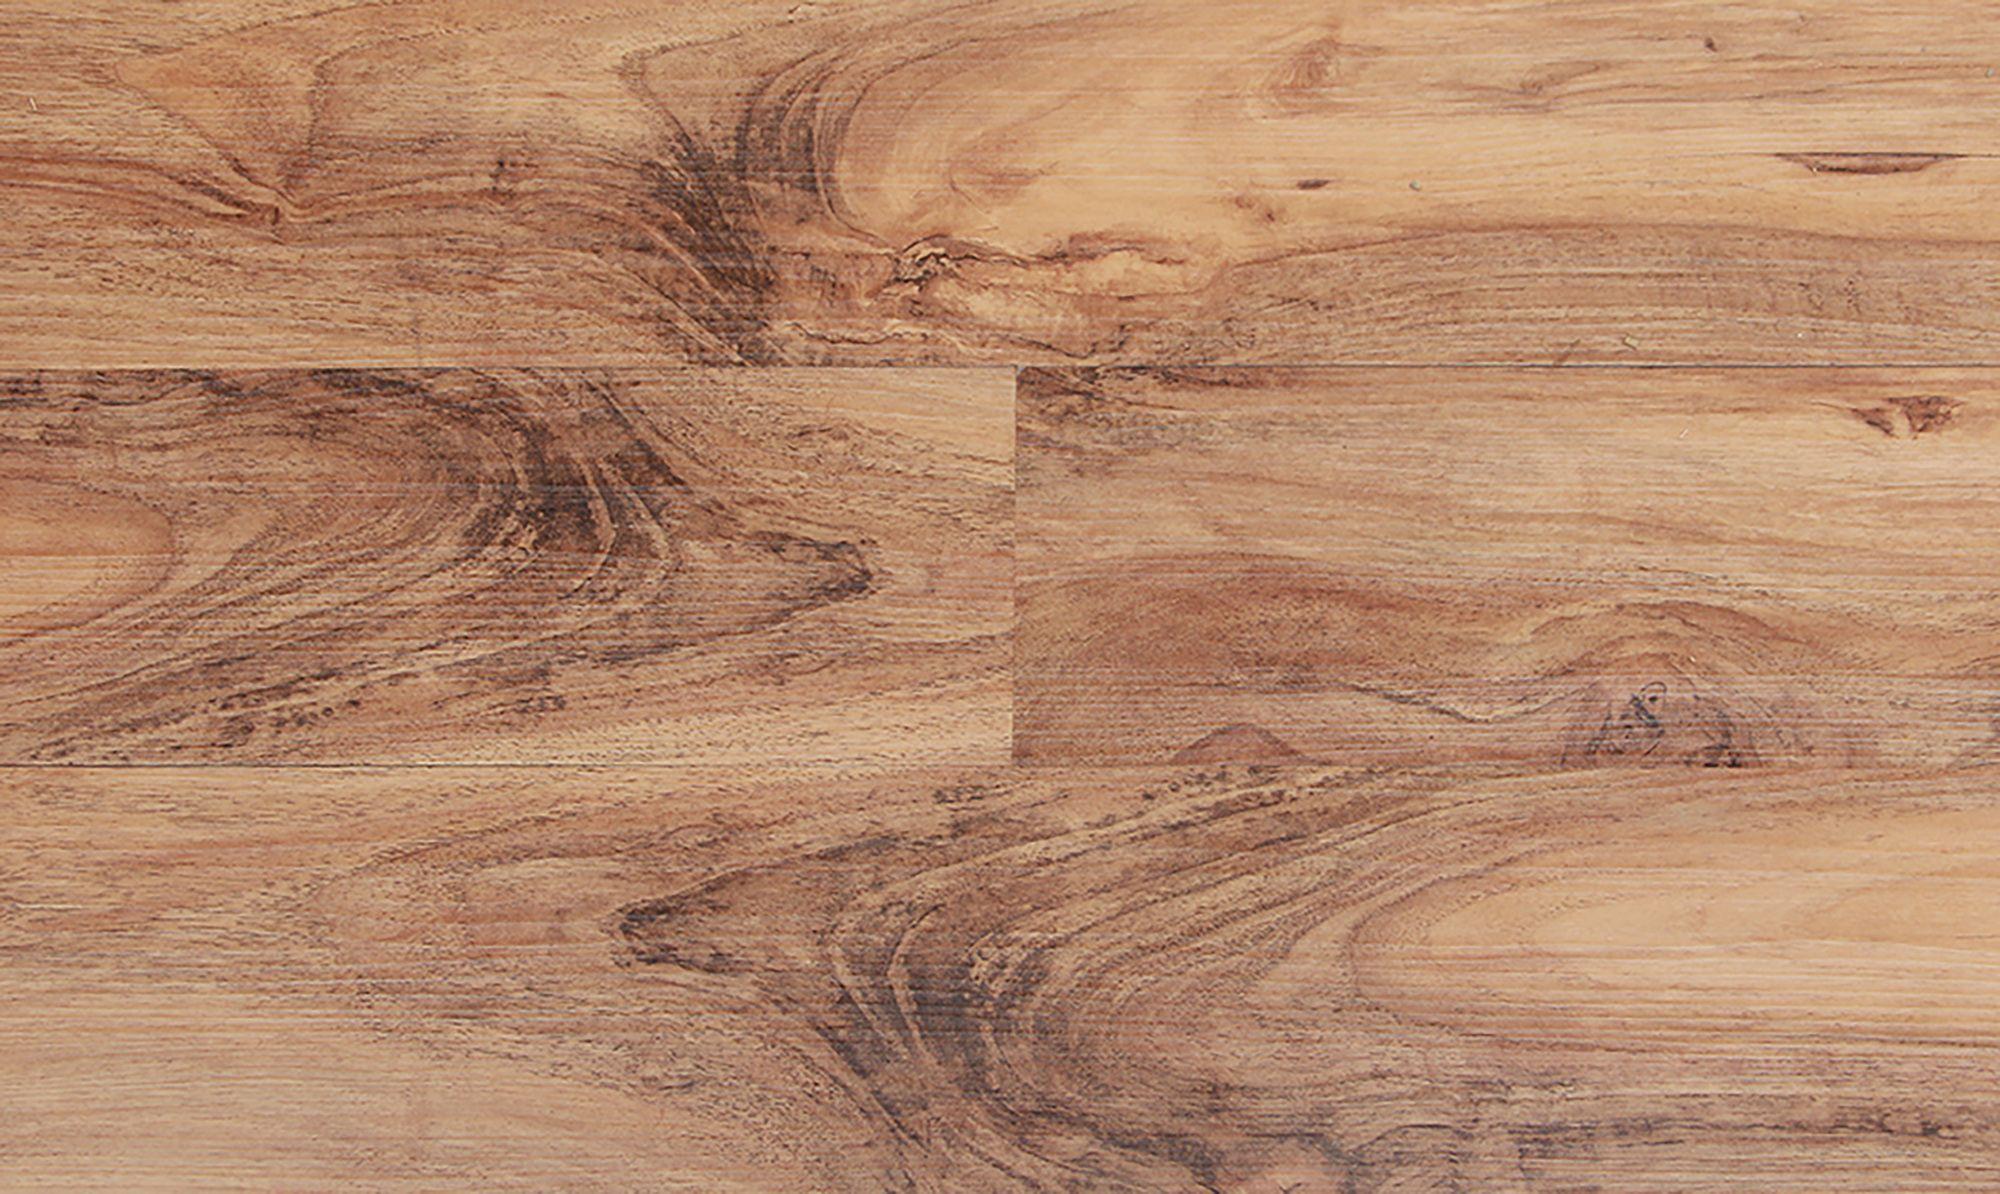 underlay high floors grab plus image down flooring leader wood instalay stick